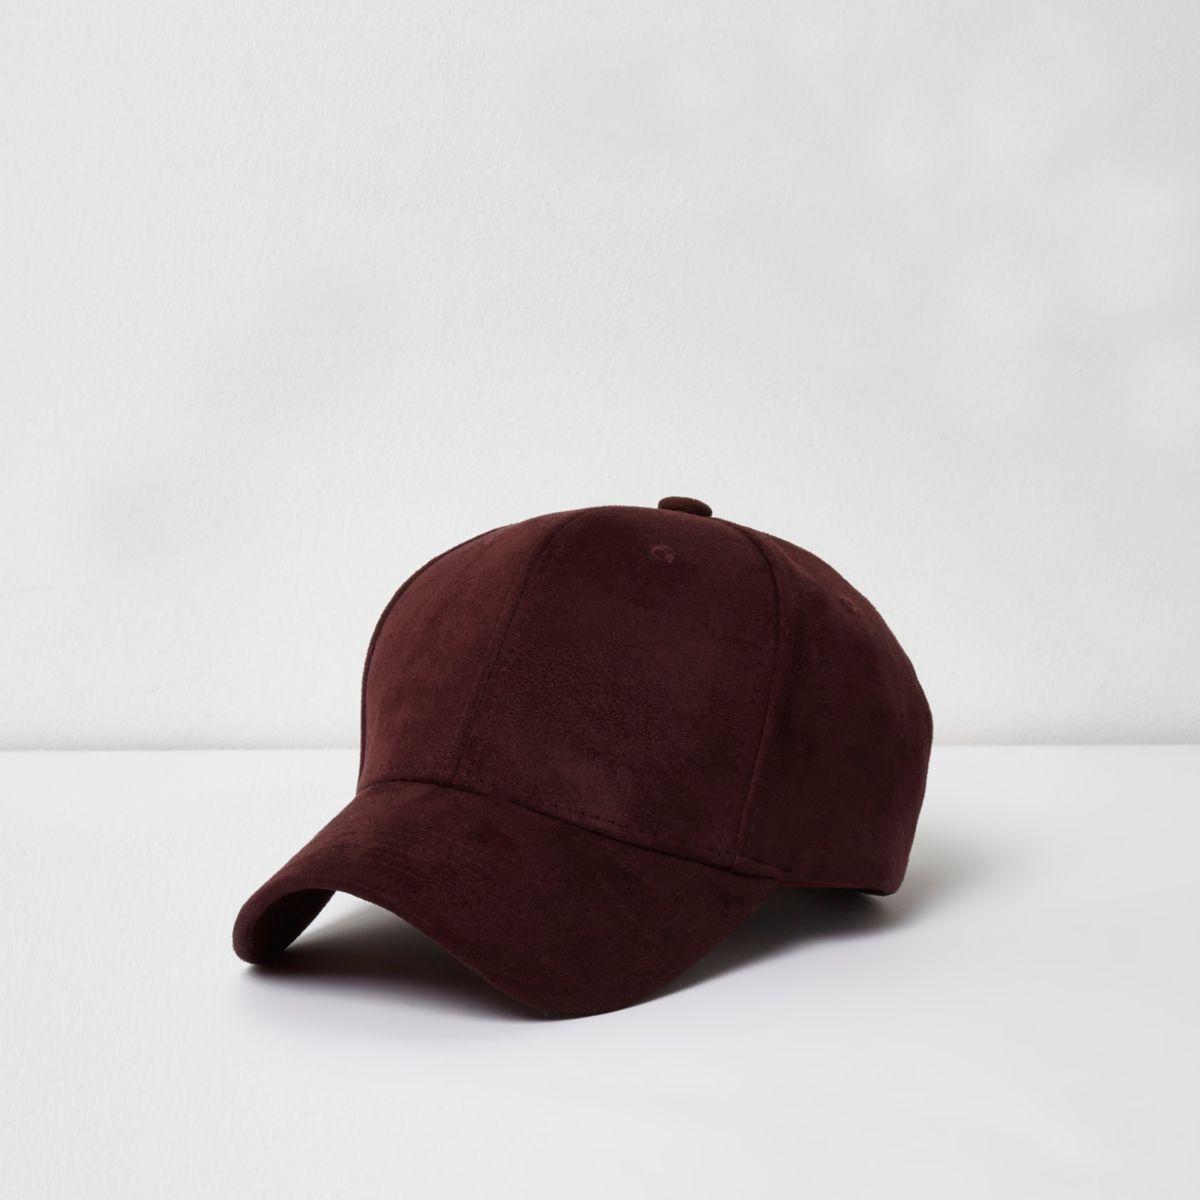 Burgundy faux suede baseball cap